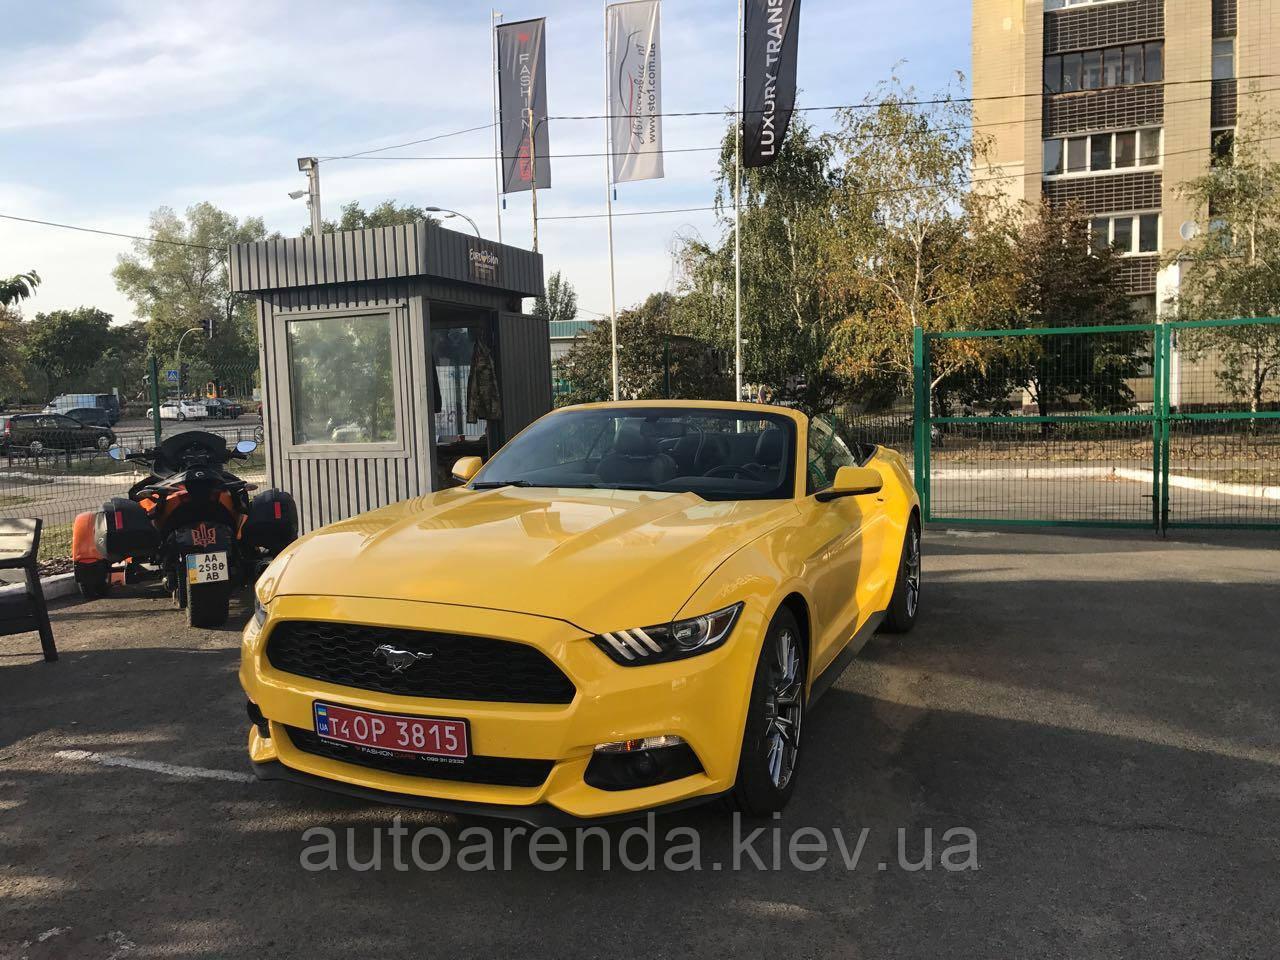 Аренда нового кабриолета Ford Mustang